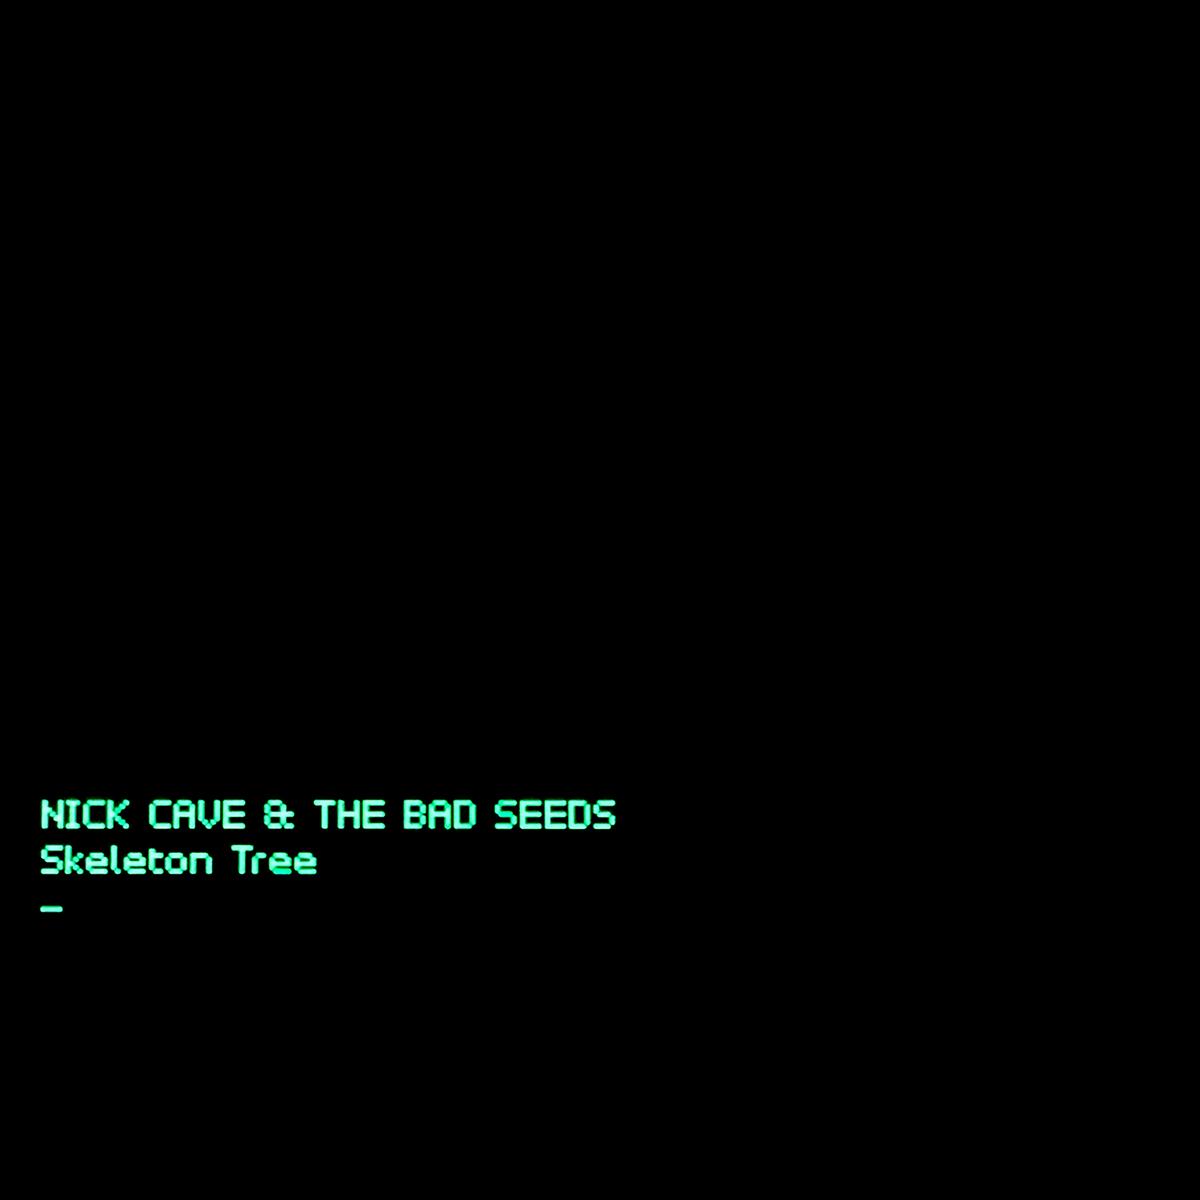 skeleton-tree-nick-cave-the-bad-seeds